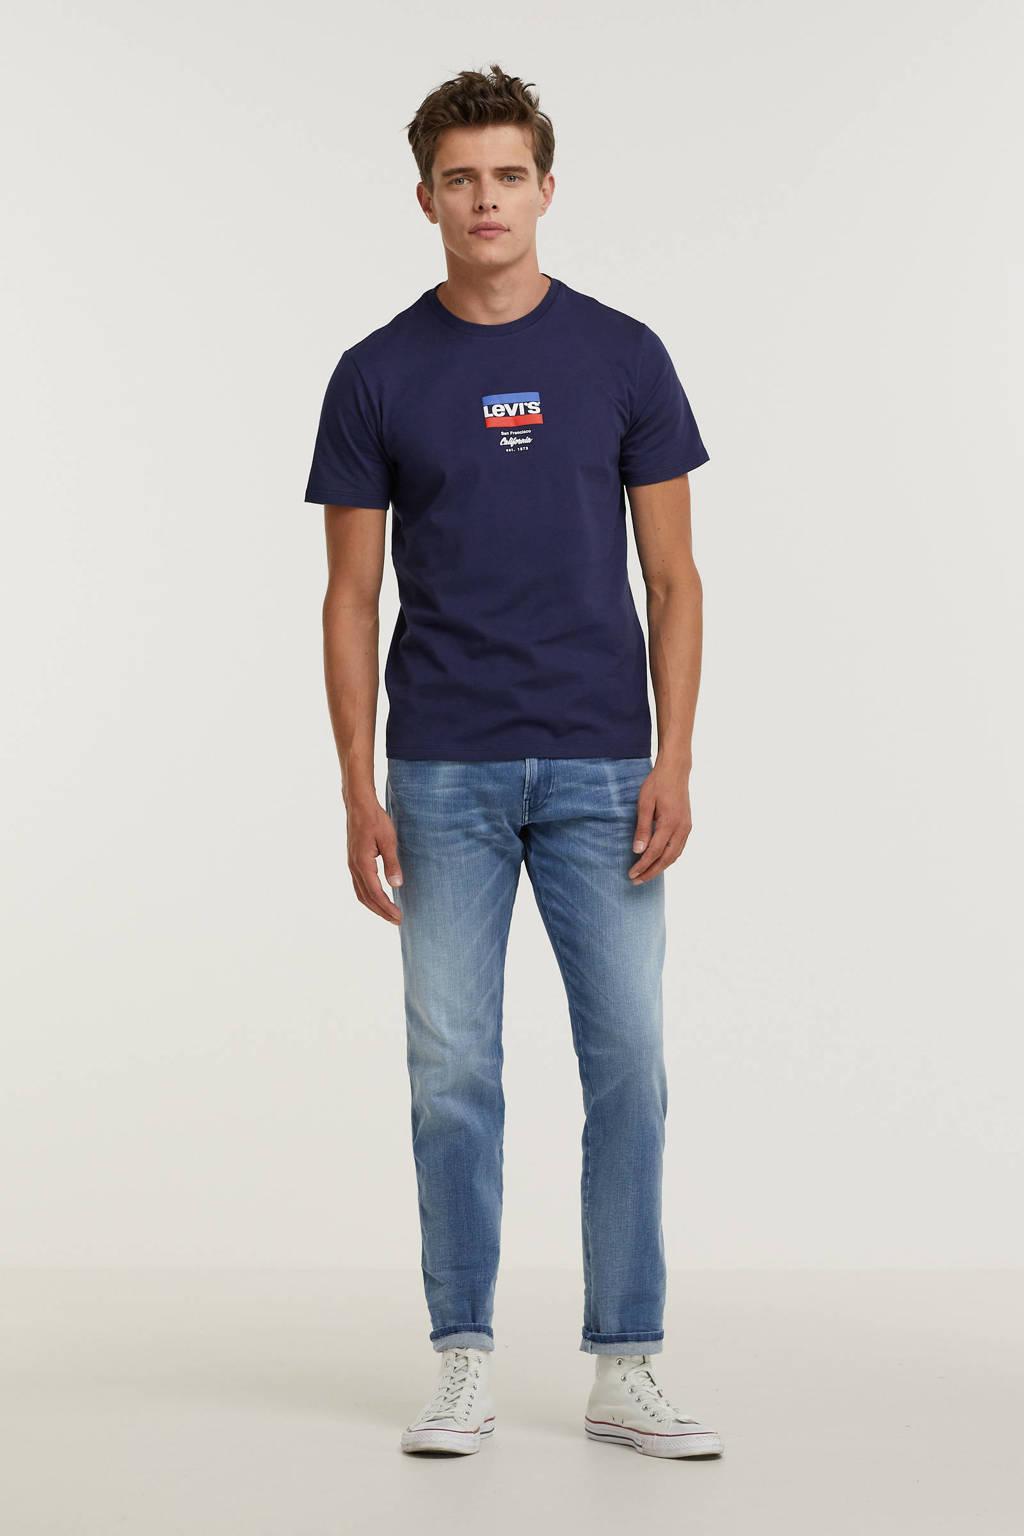 Levi's T-shirt met logo blauw, Blauw